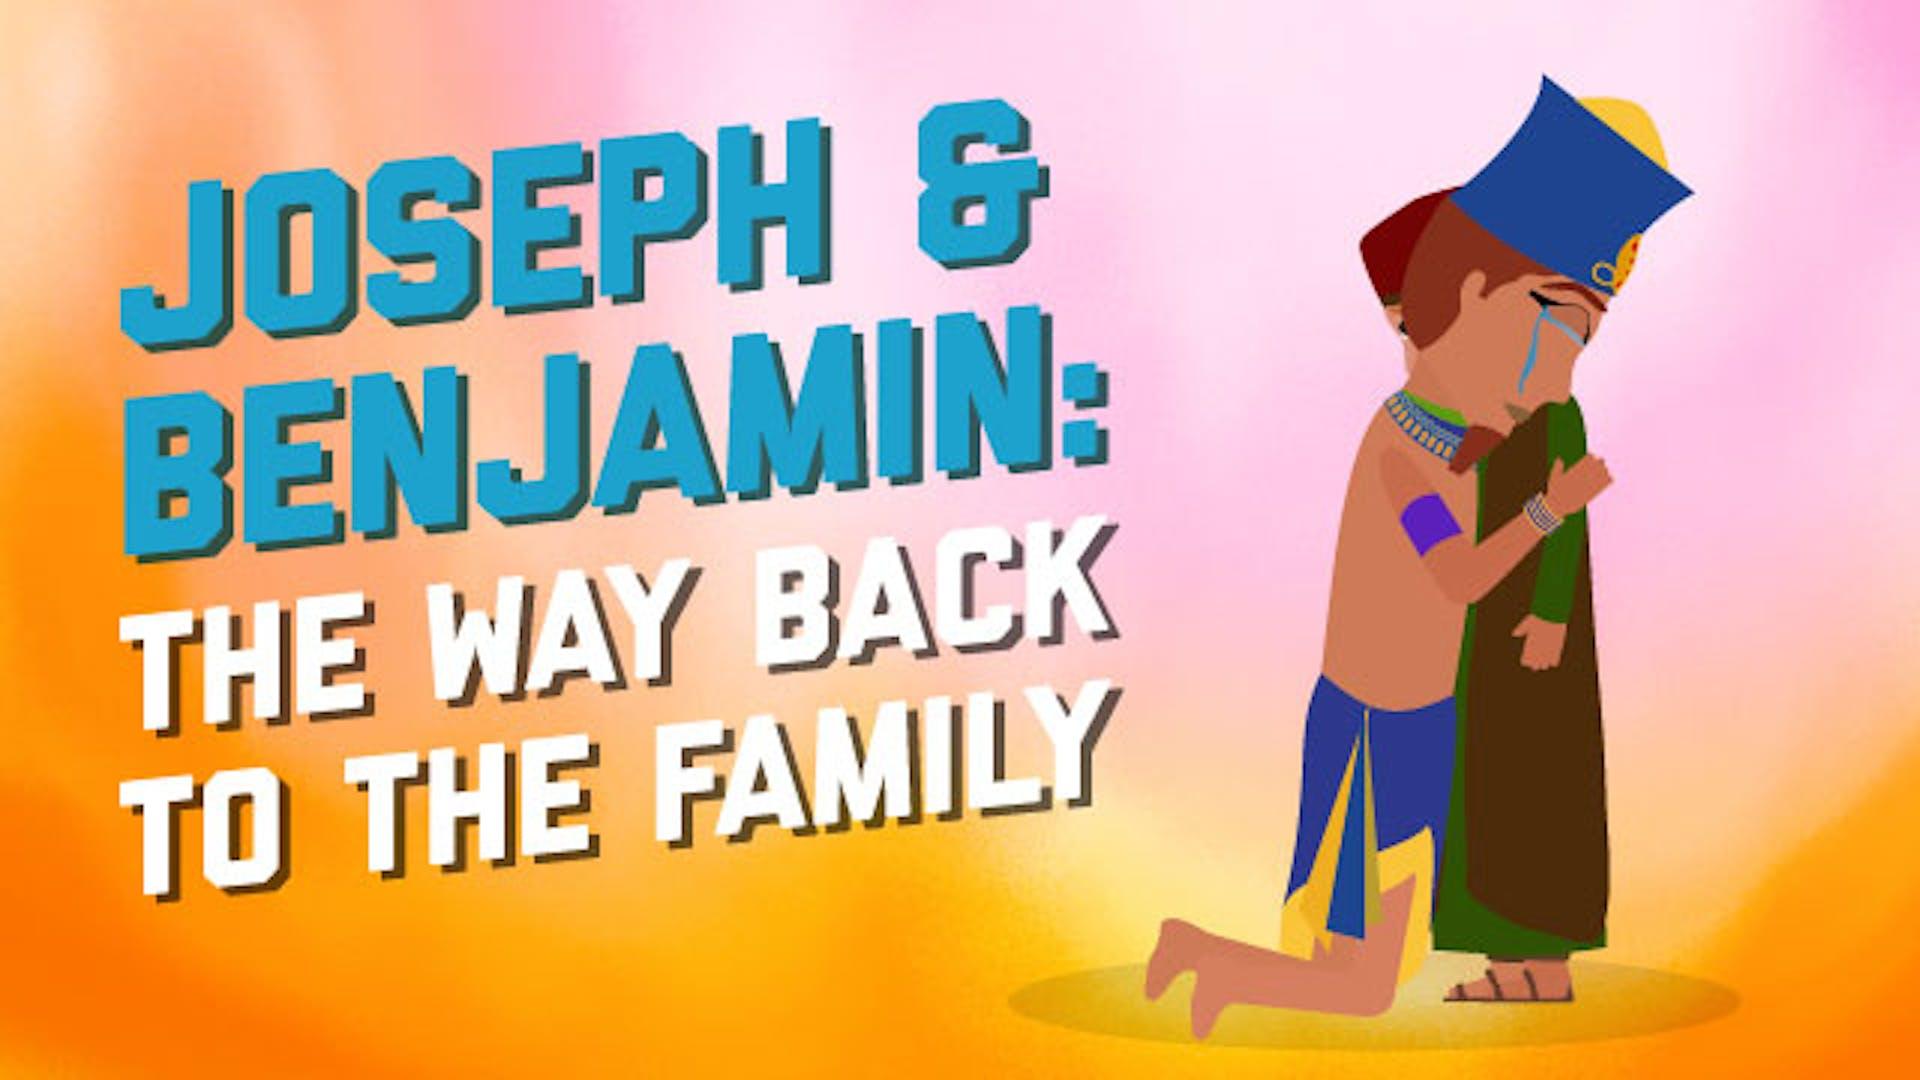 Joseph saves family Benjamin brothers